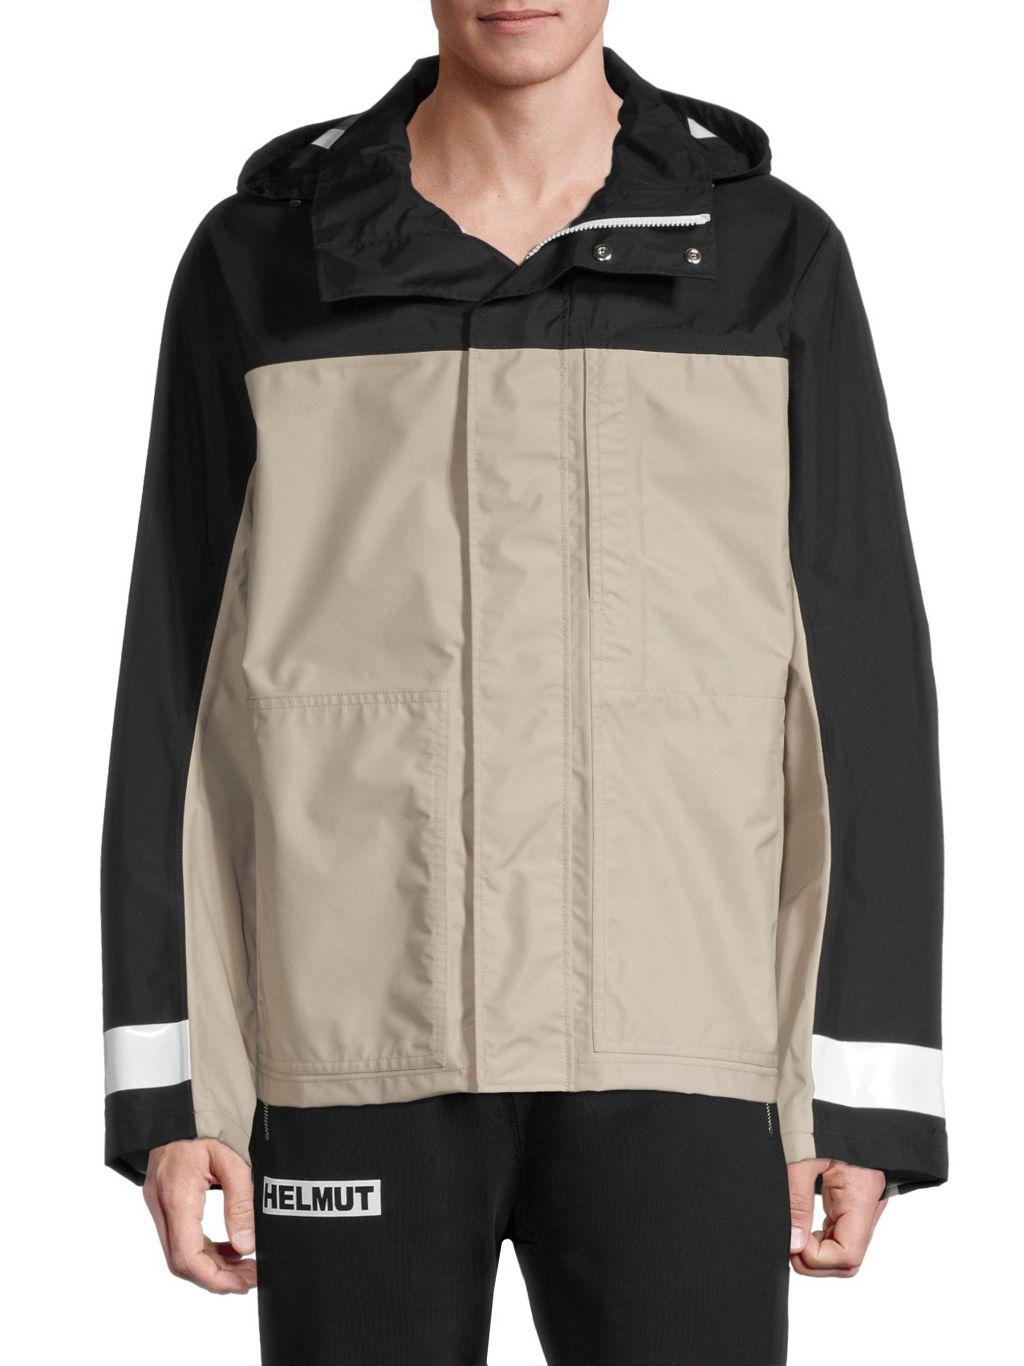 Helmut Lang Tech Hooded Zip-Up Jacket